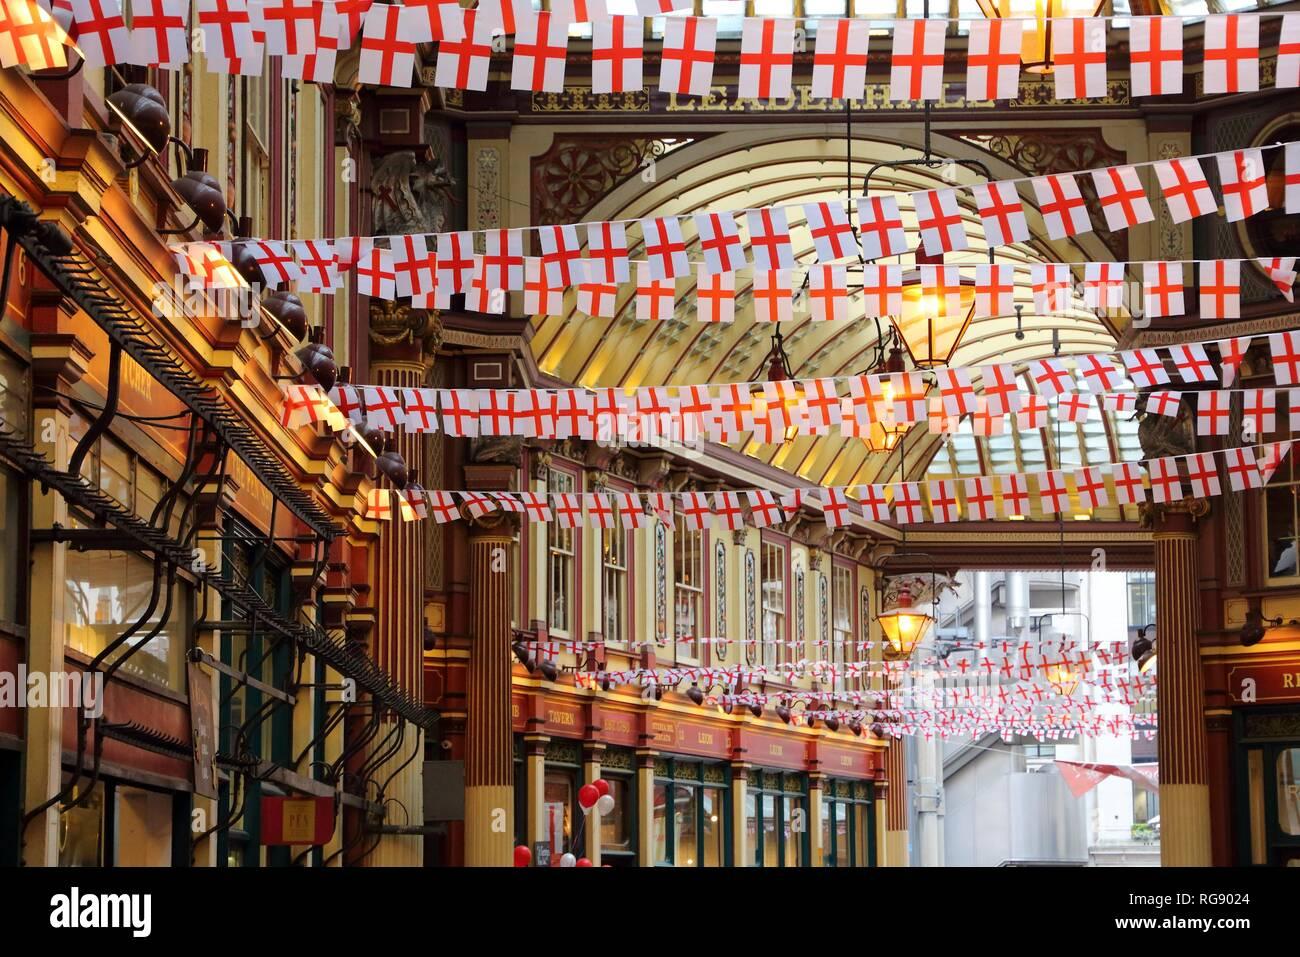 LONDON, UK - APRIL 22, 2016: Saint George's Day decorations in Leadenhall Market, London. Saint George is the patron saint of England. Stock Photo